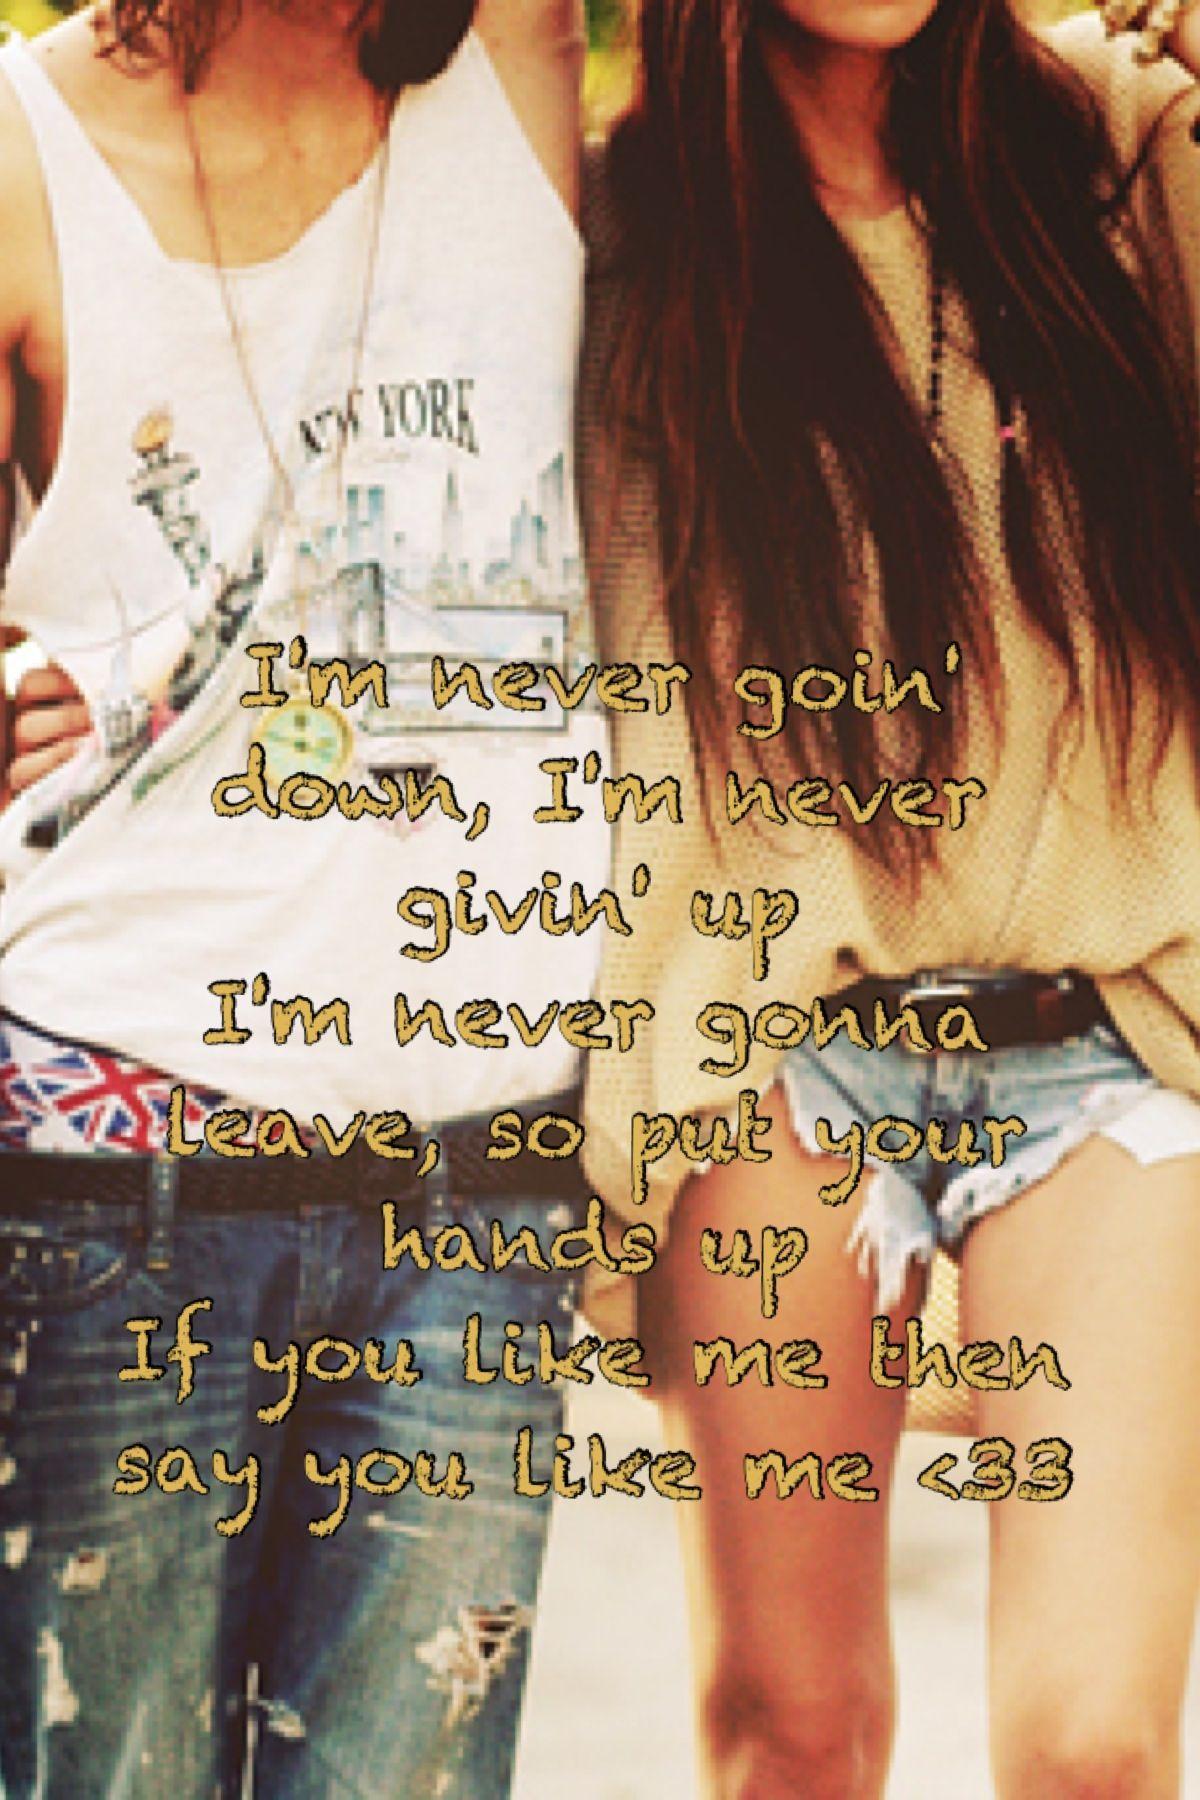 if you like me then say you like me lyrics